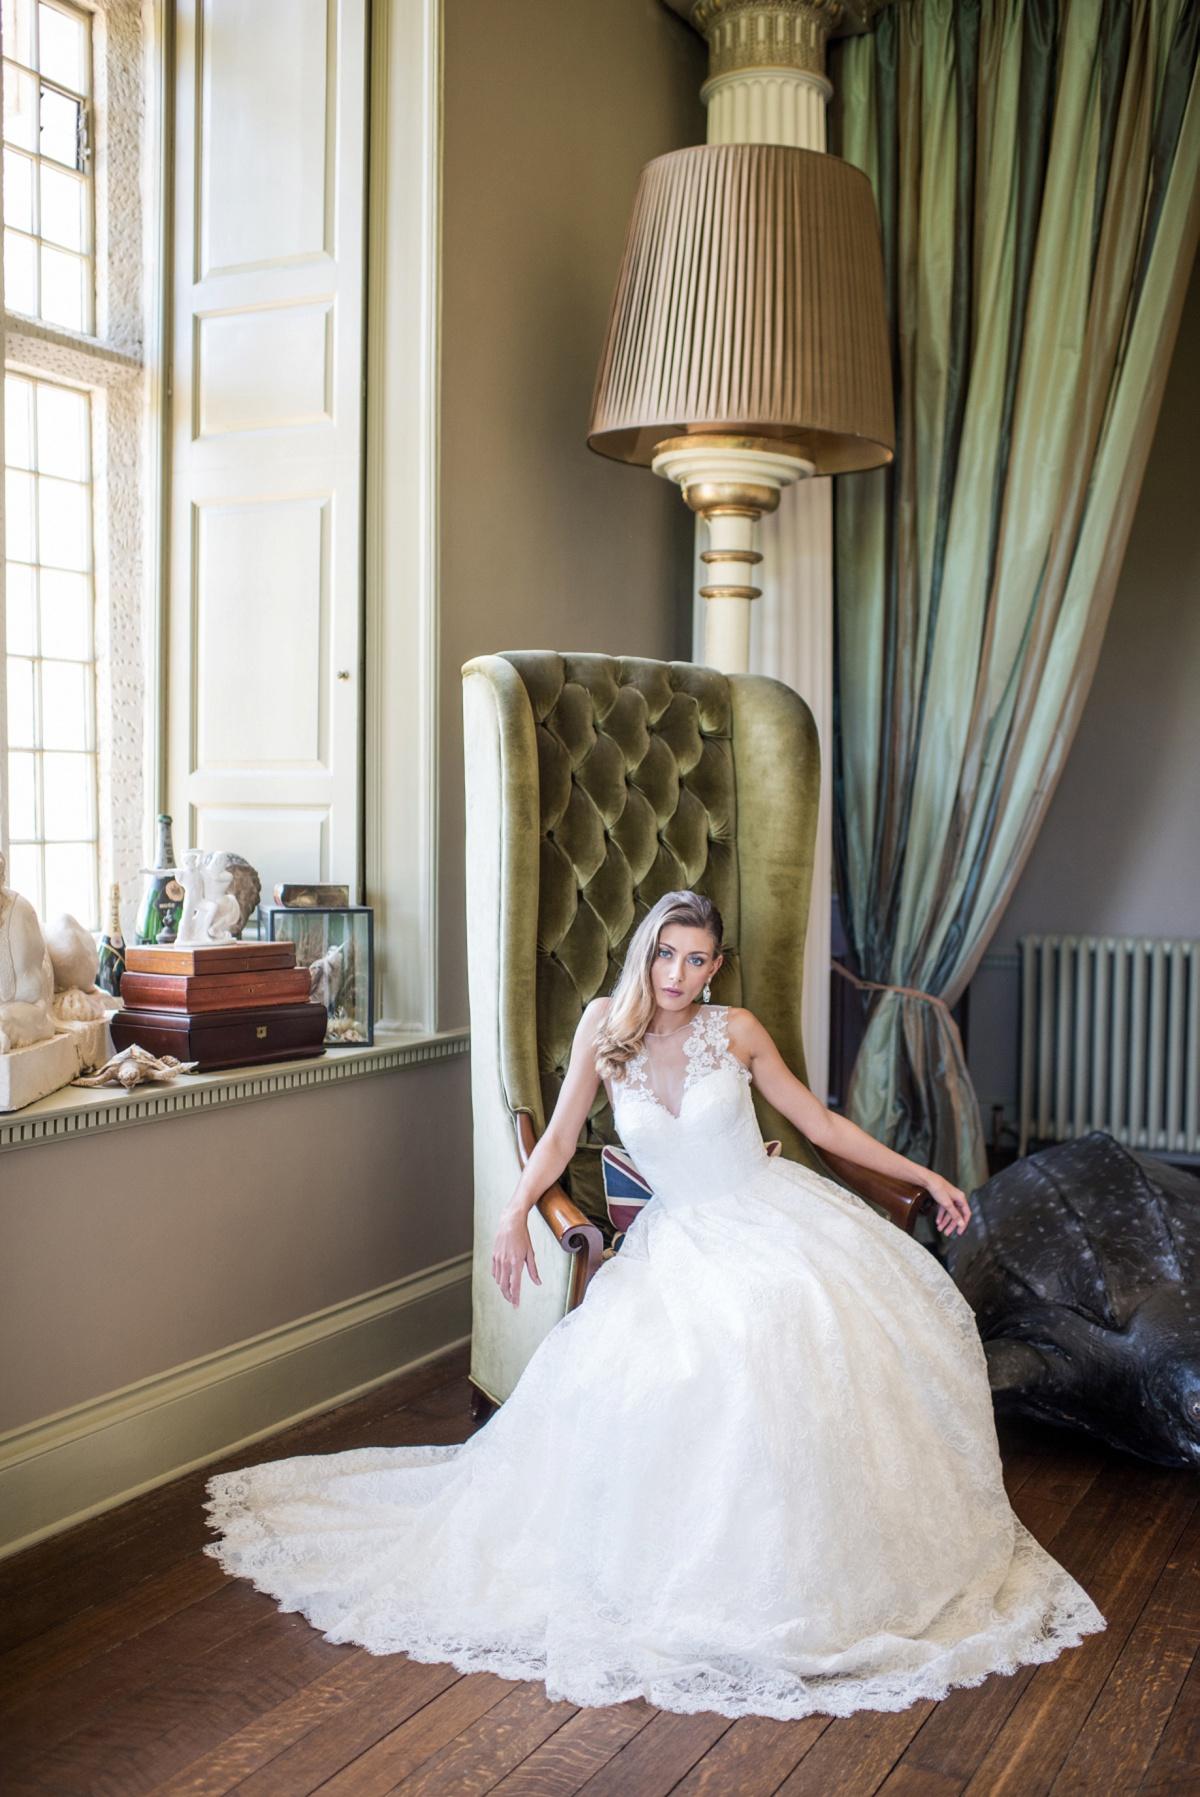 Caroline Castigliano x Howsham Hall (c) Jane Beadnell Photography (10)